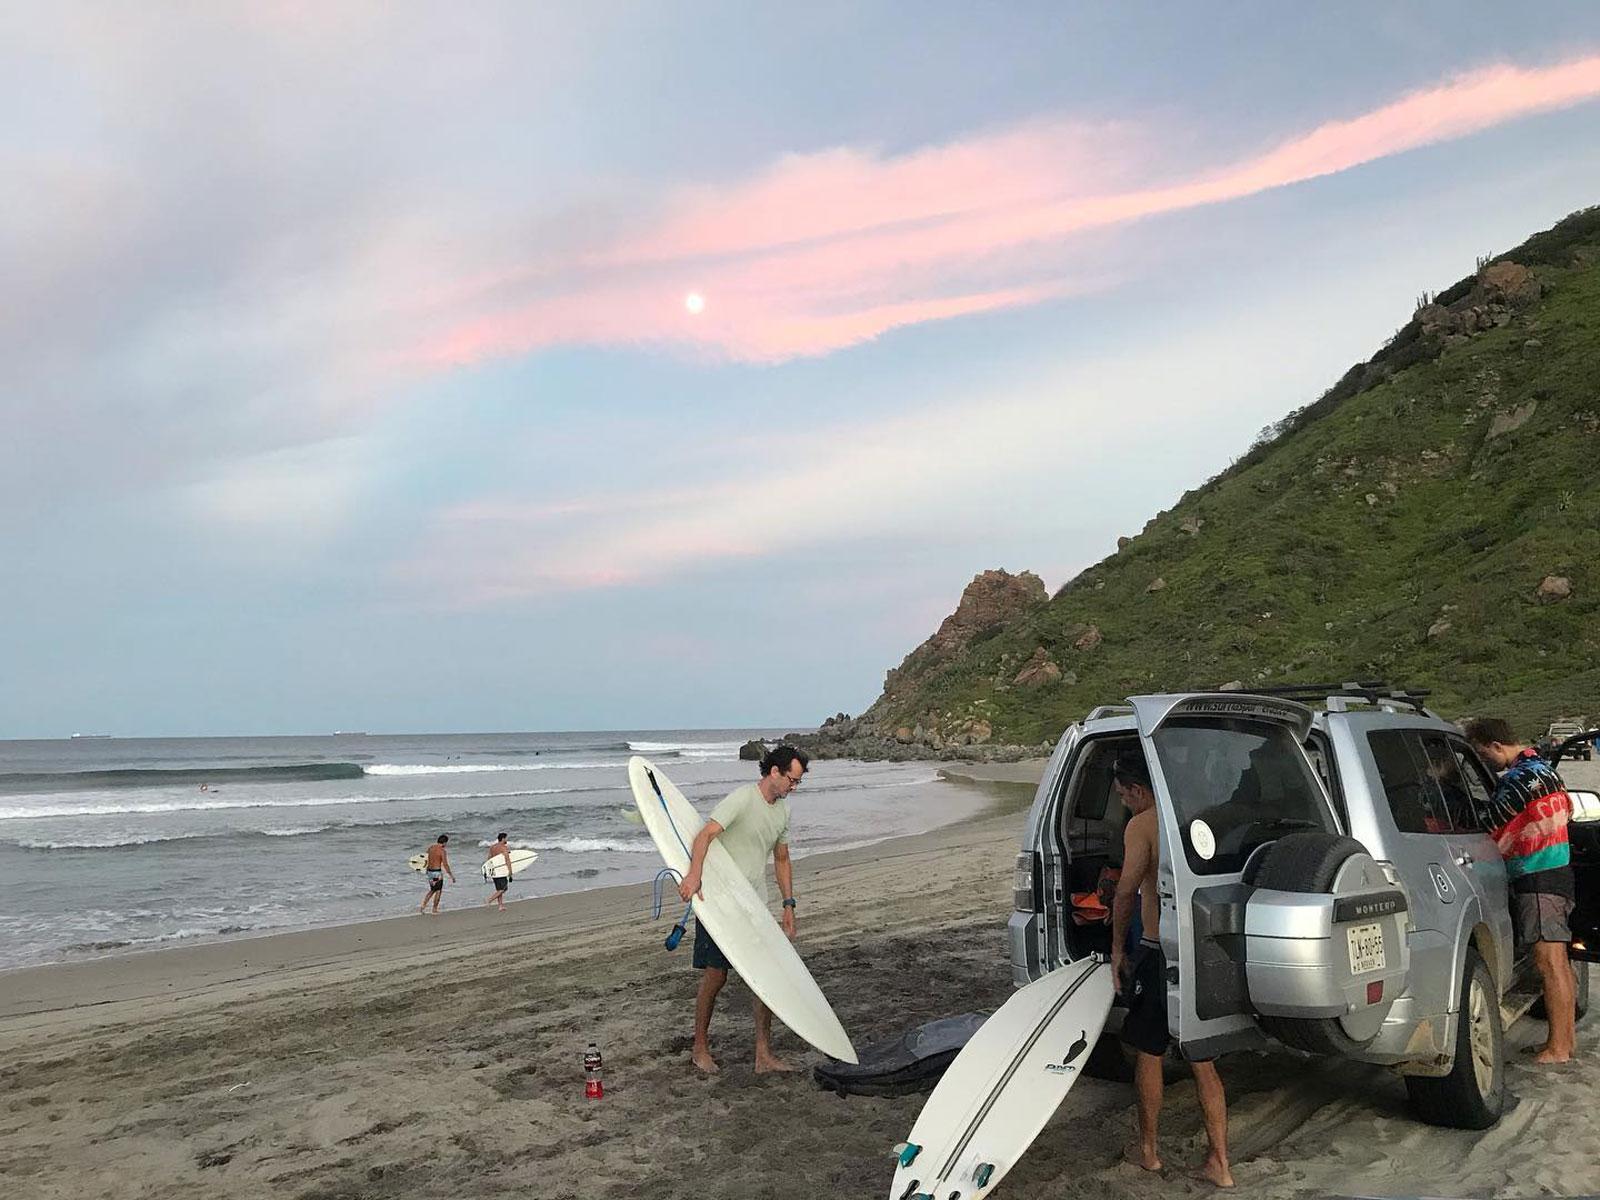 Las Palmeras Surf Camp, Salina Cruz, Oaxaca, Mexico, September 2020